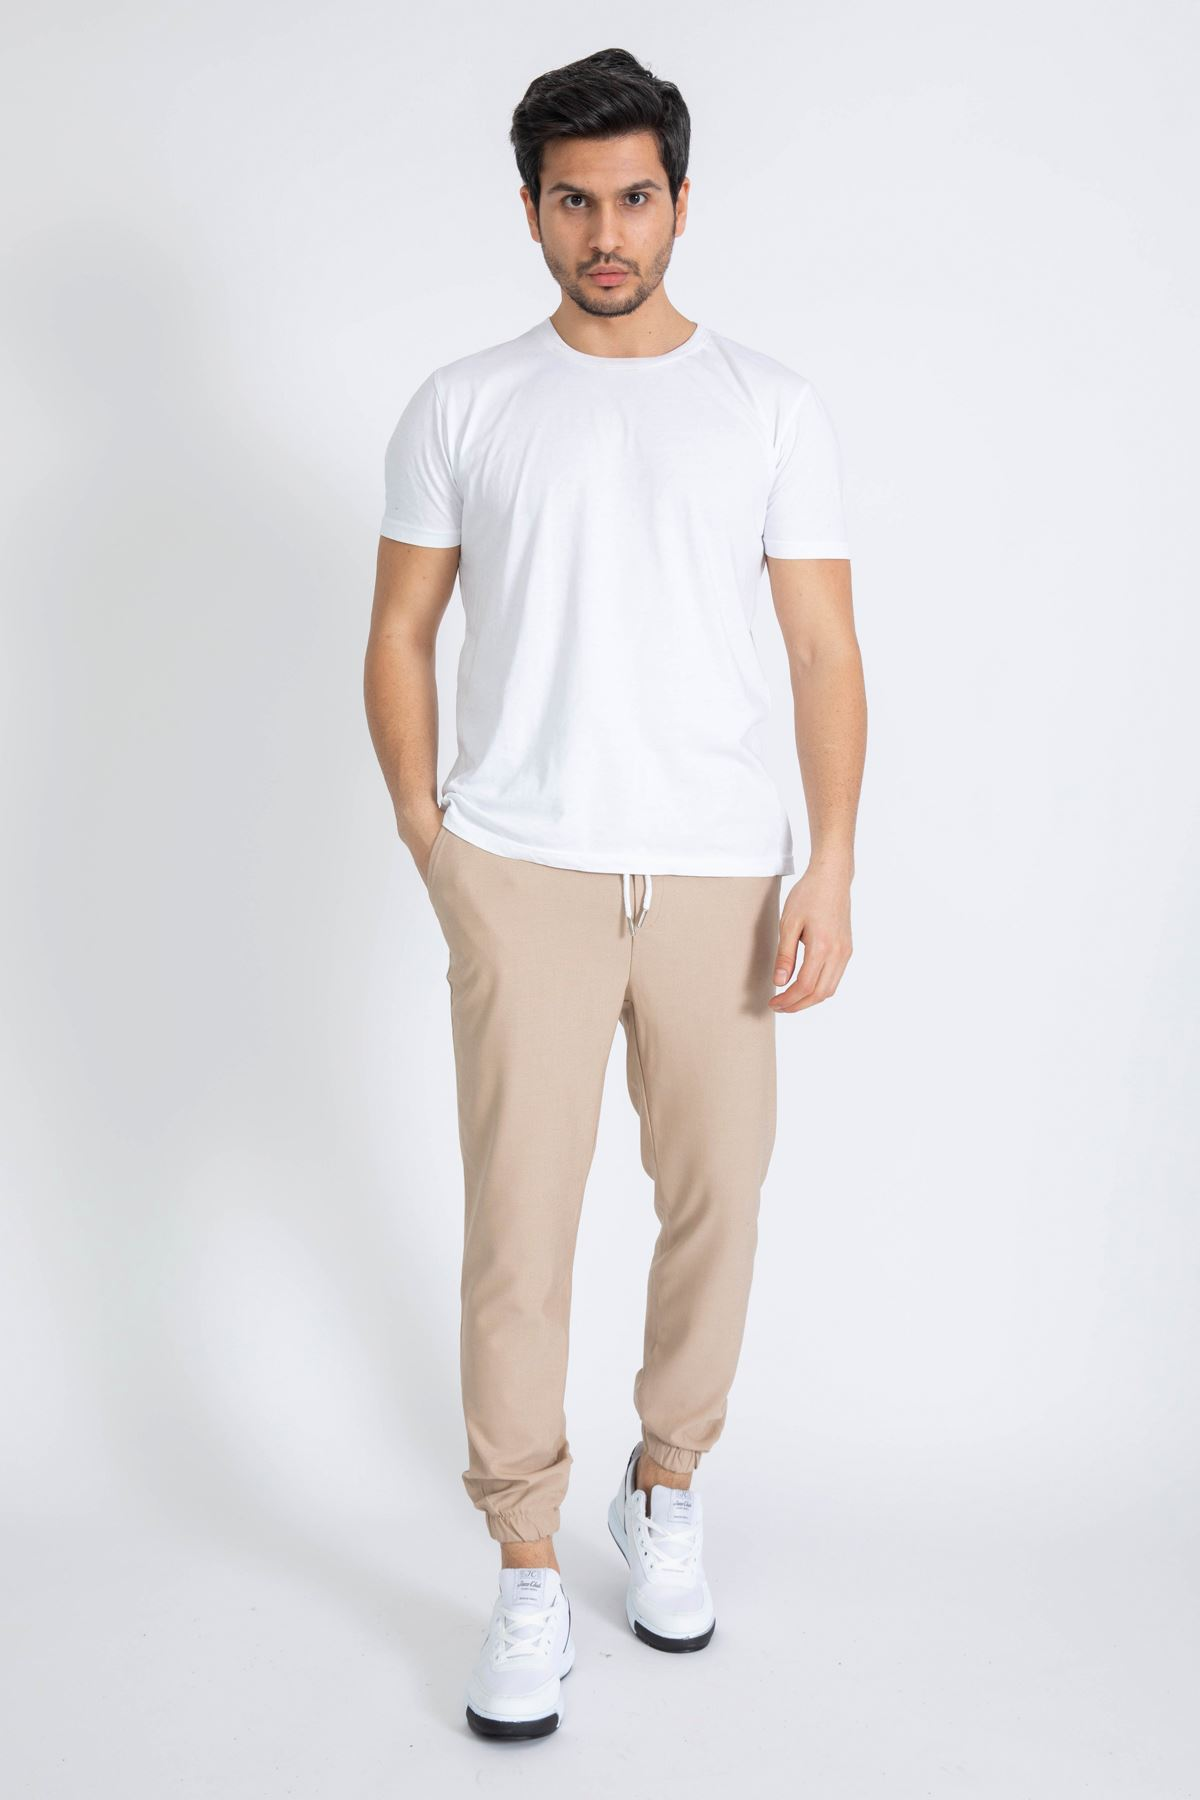 Erkek Paça Lastikli Vizon Dalgıç Pantolon